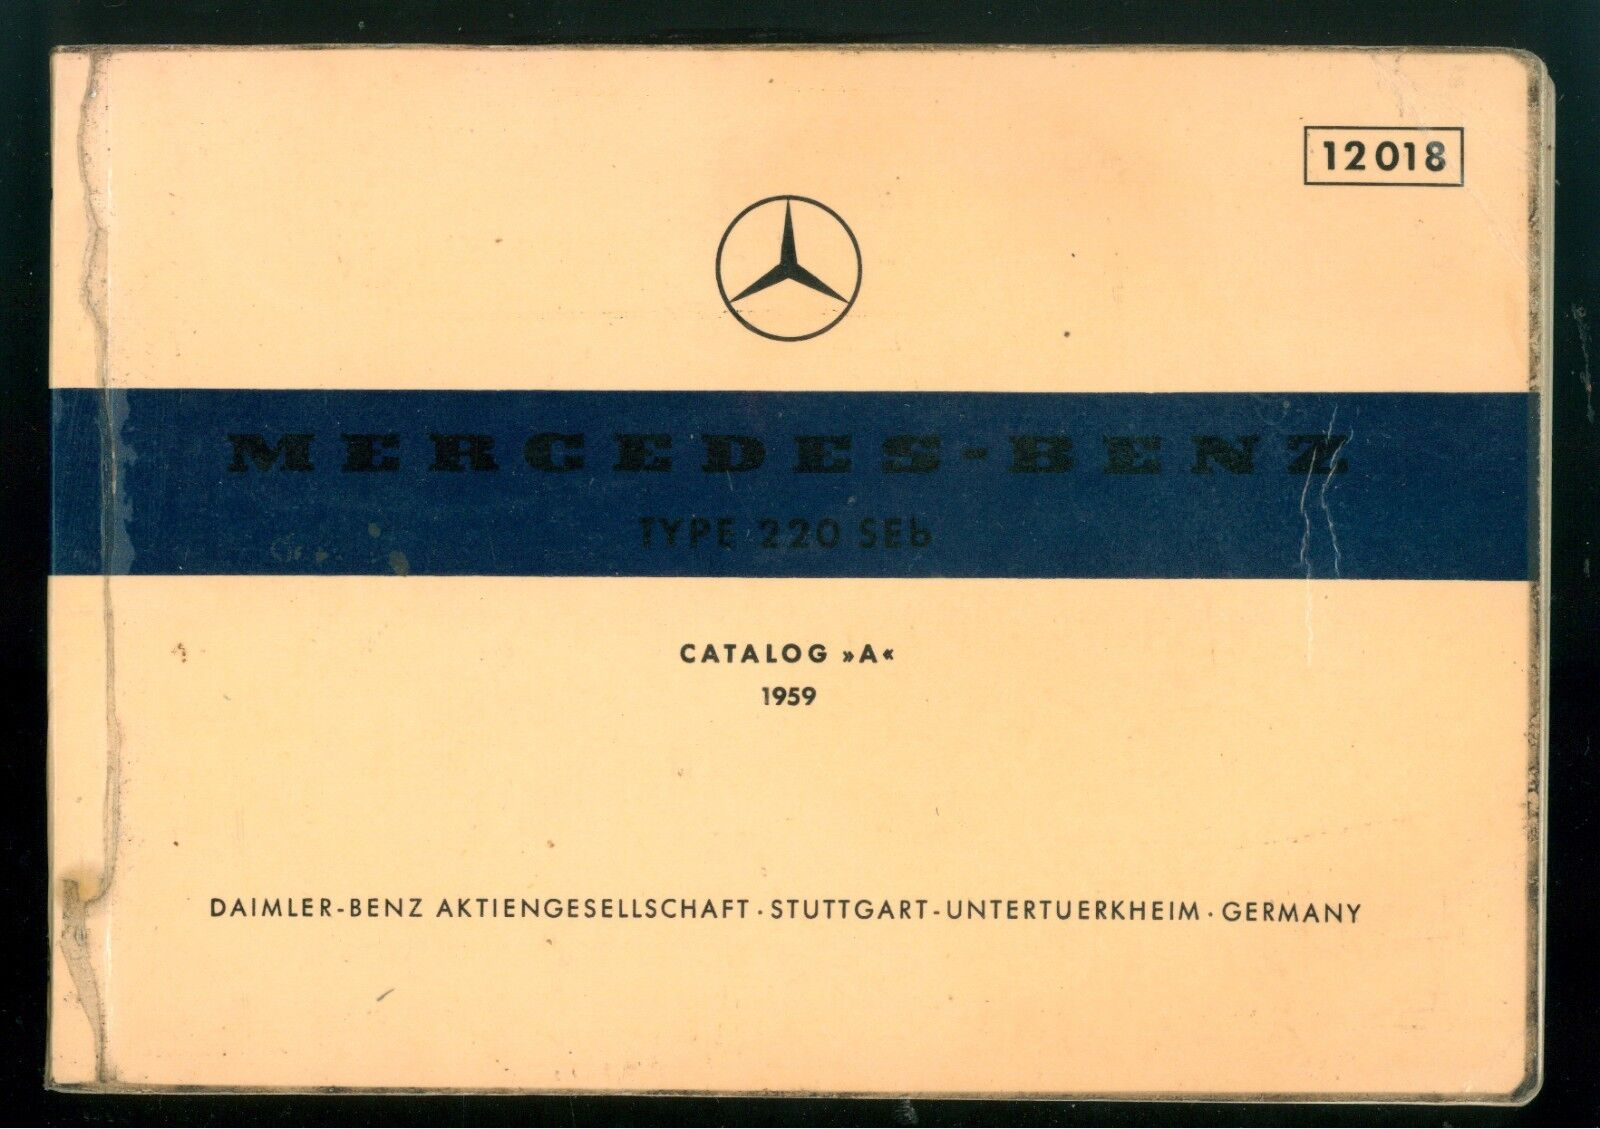 MERCEDES BENZ TYPE 220 SEB CATALOG A 1959 AUTOMOBILI MACCHINE MOTORI